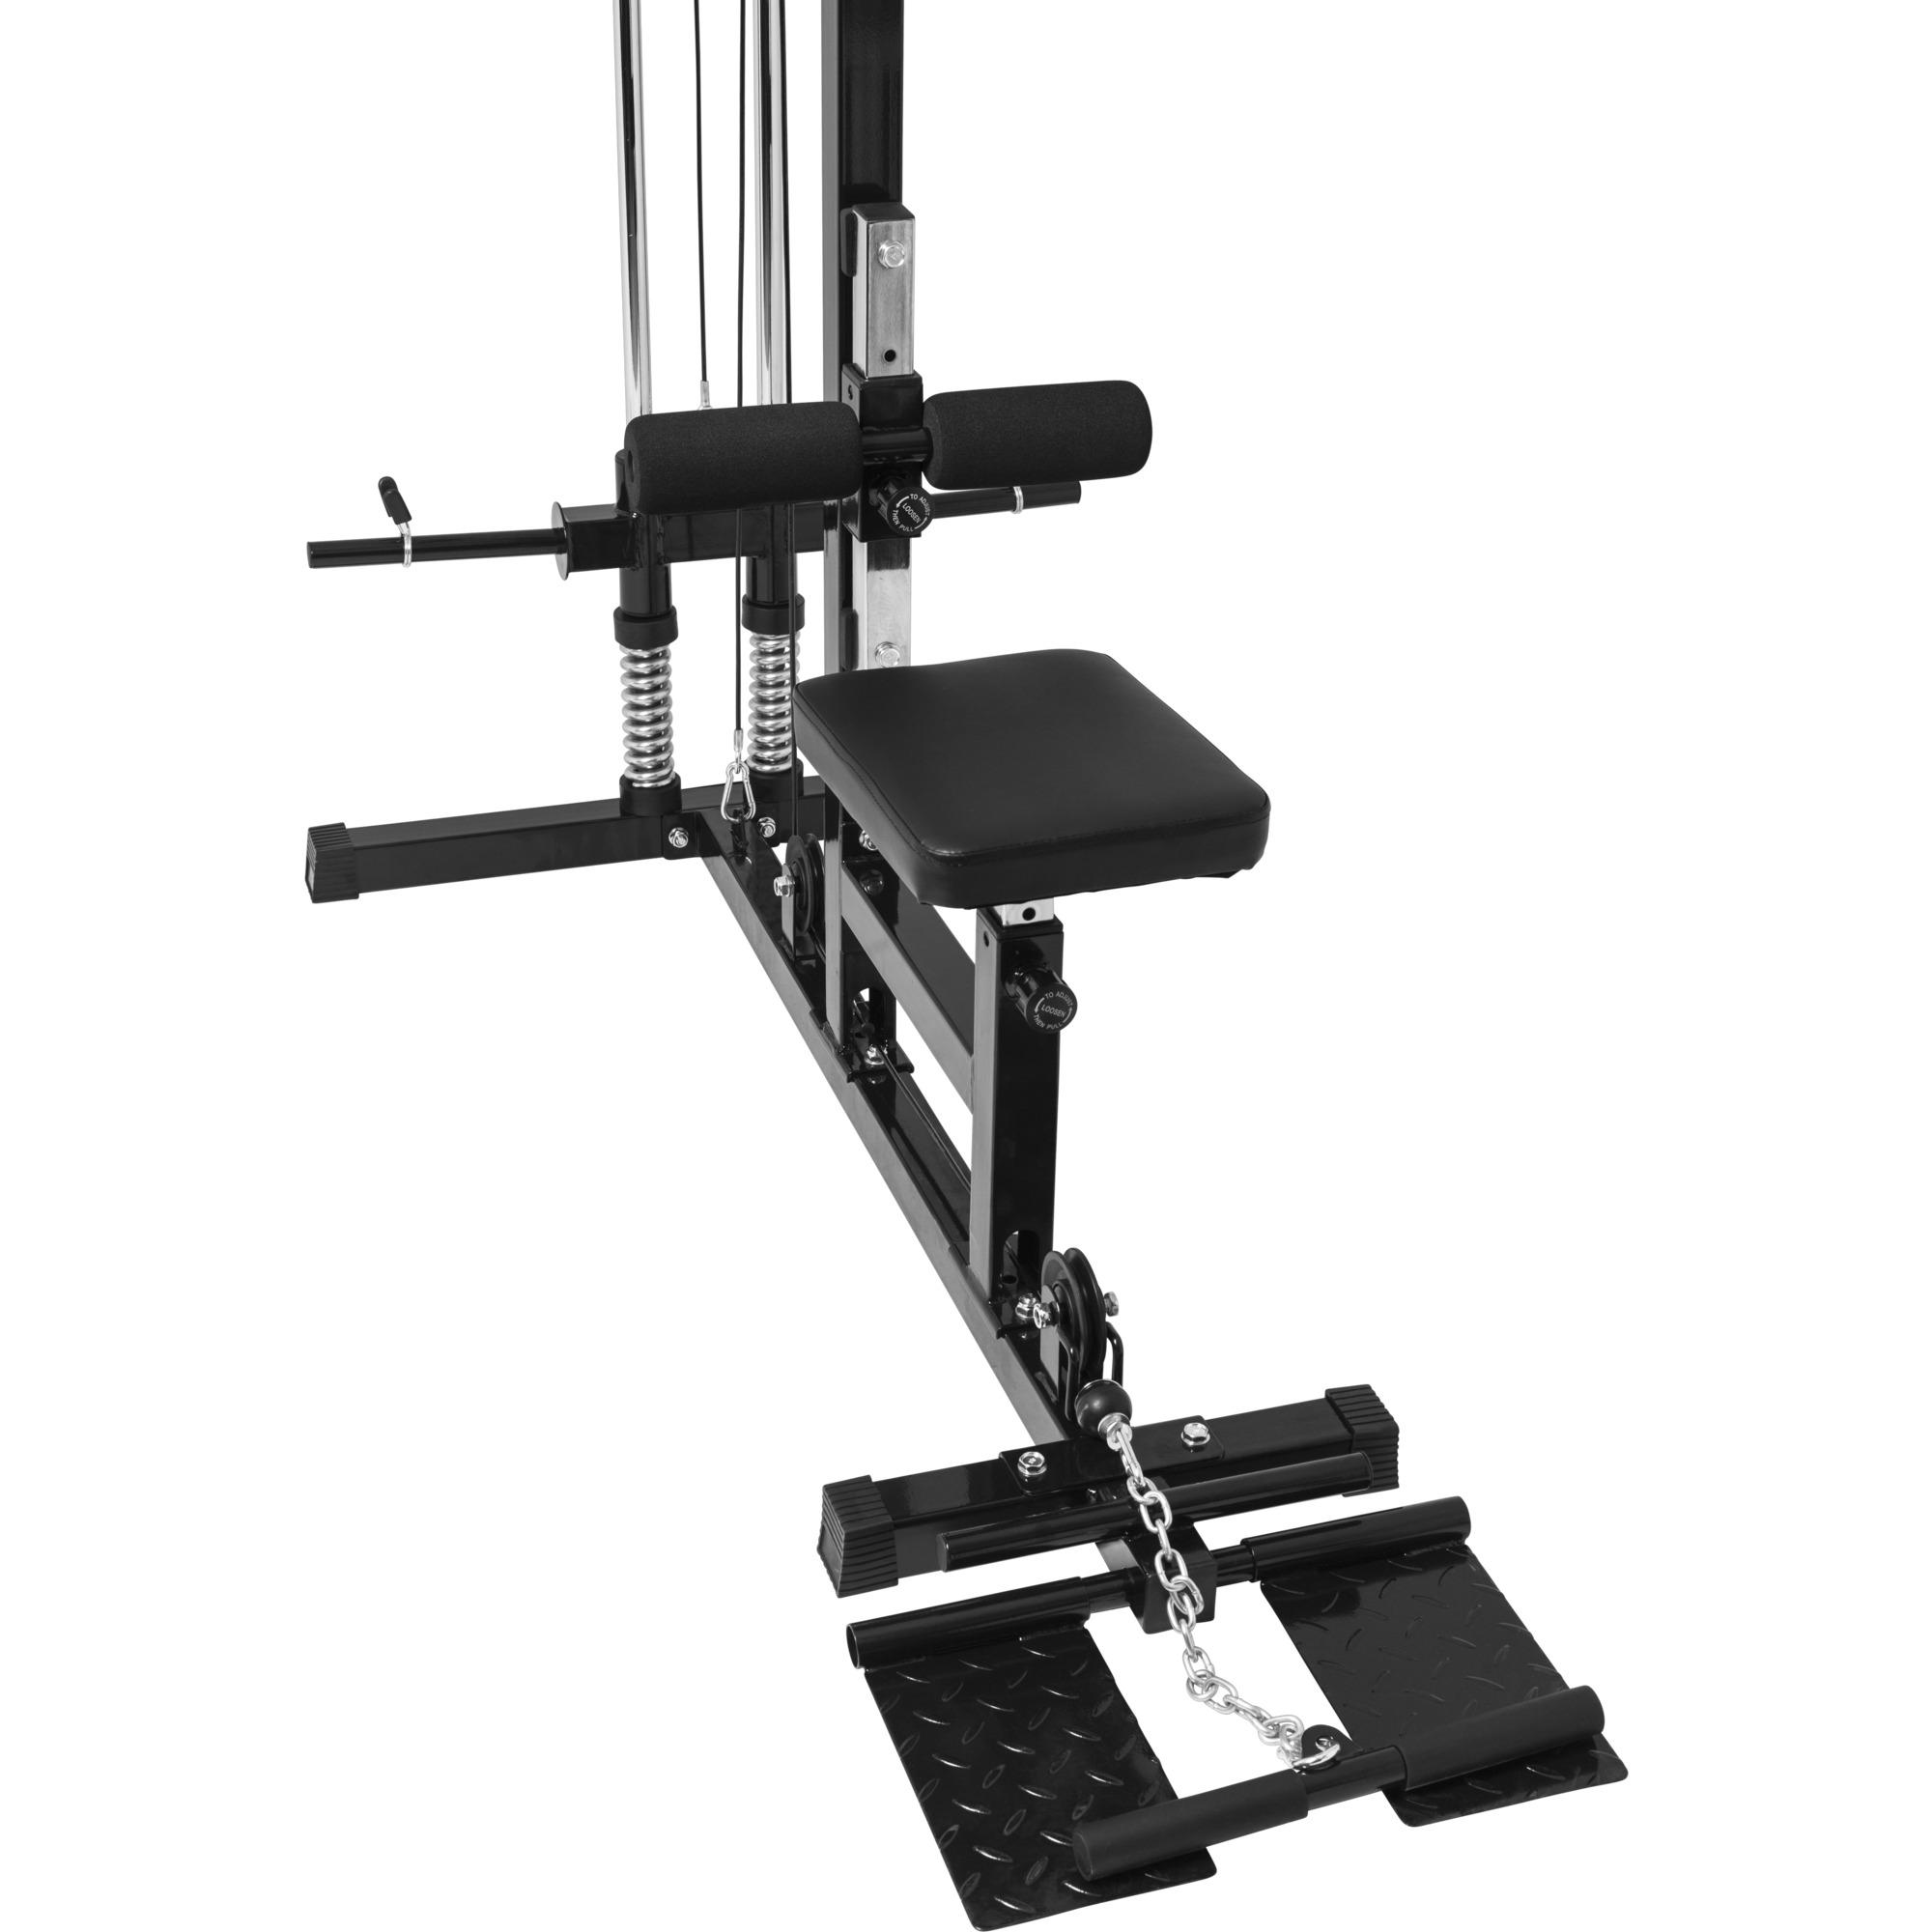 station de traction poulie haute charge guid e amortie. Black Bedroom Furniture Sets. Home Design Ideas